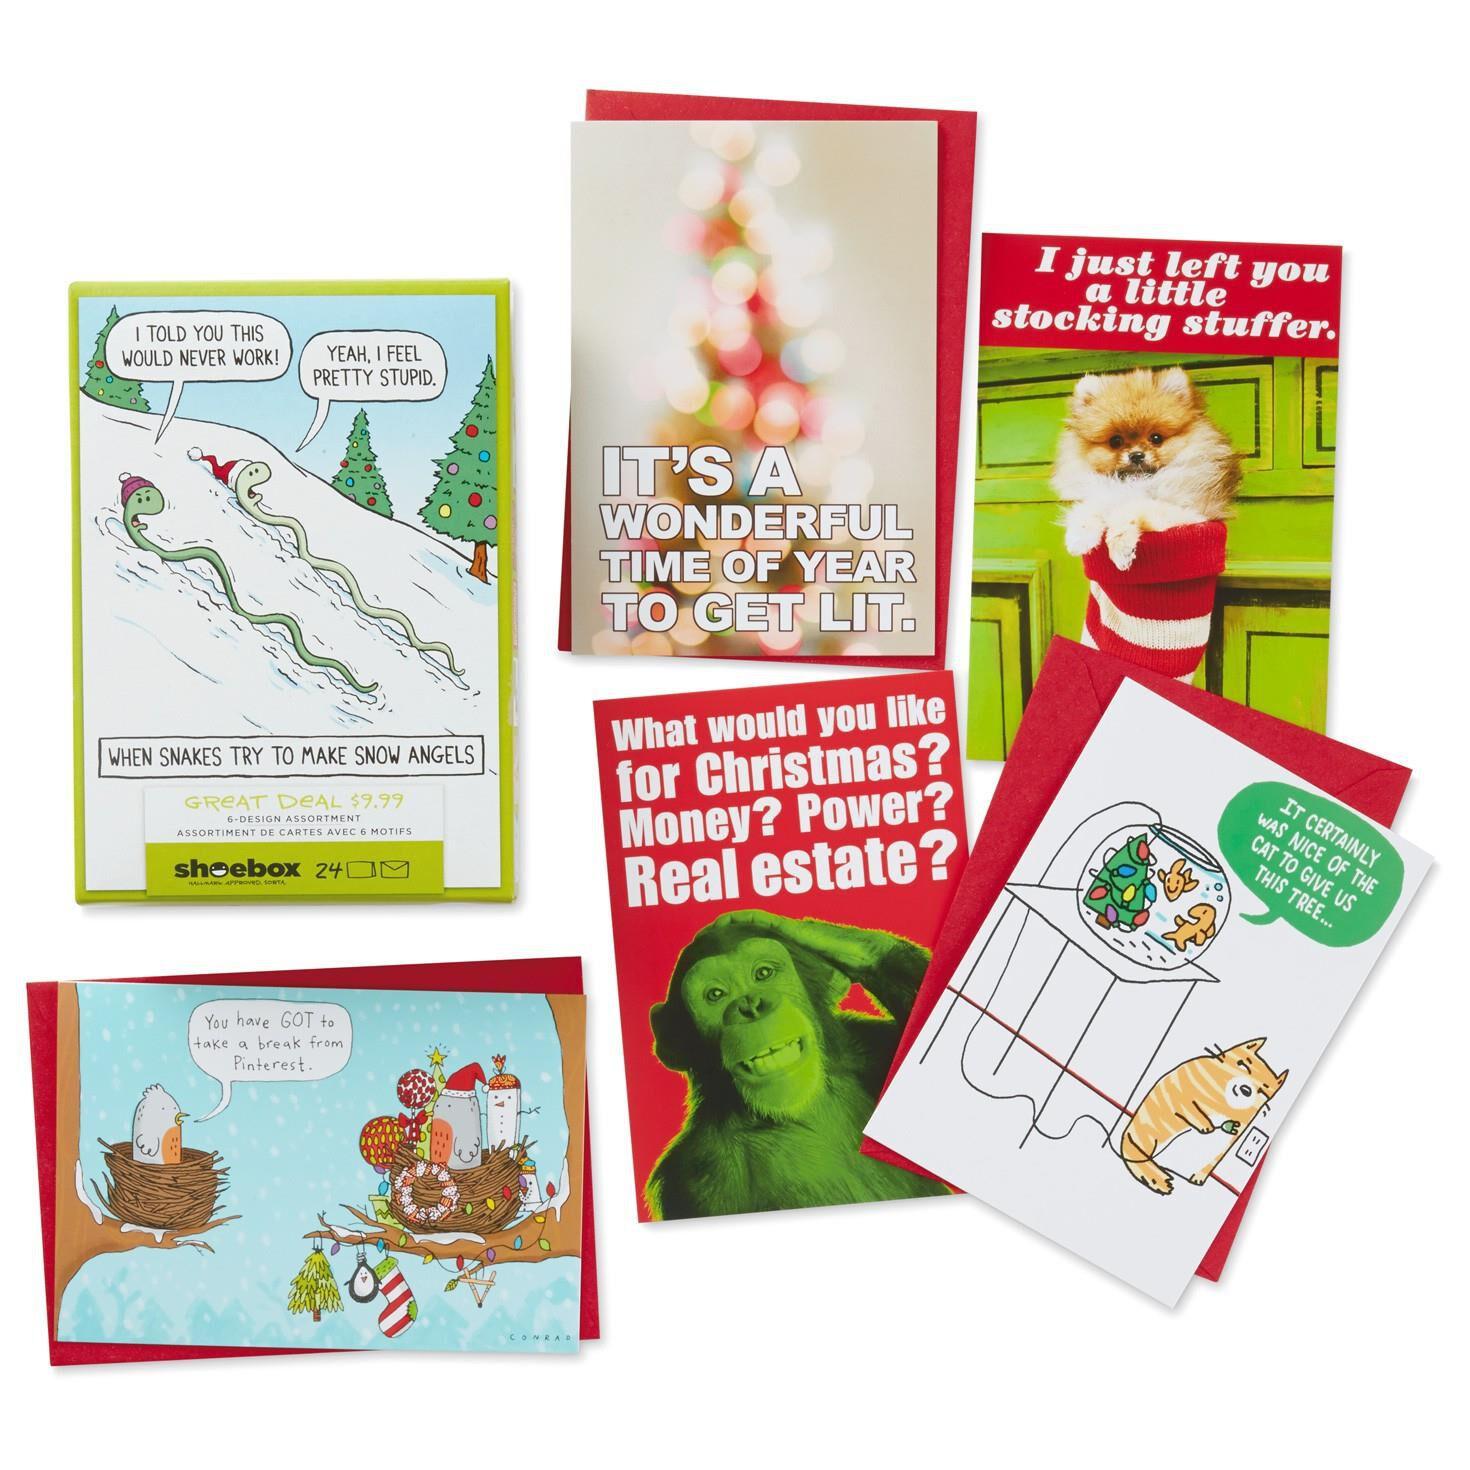 shoebox christmas cards - Shoebox Christmas Cards